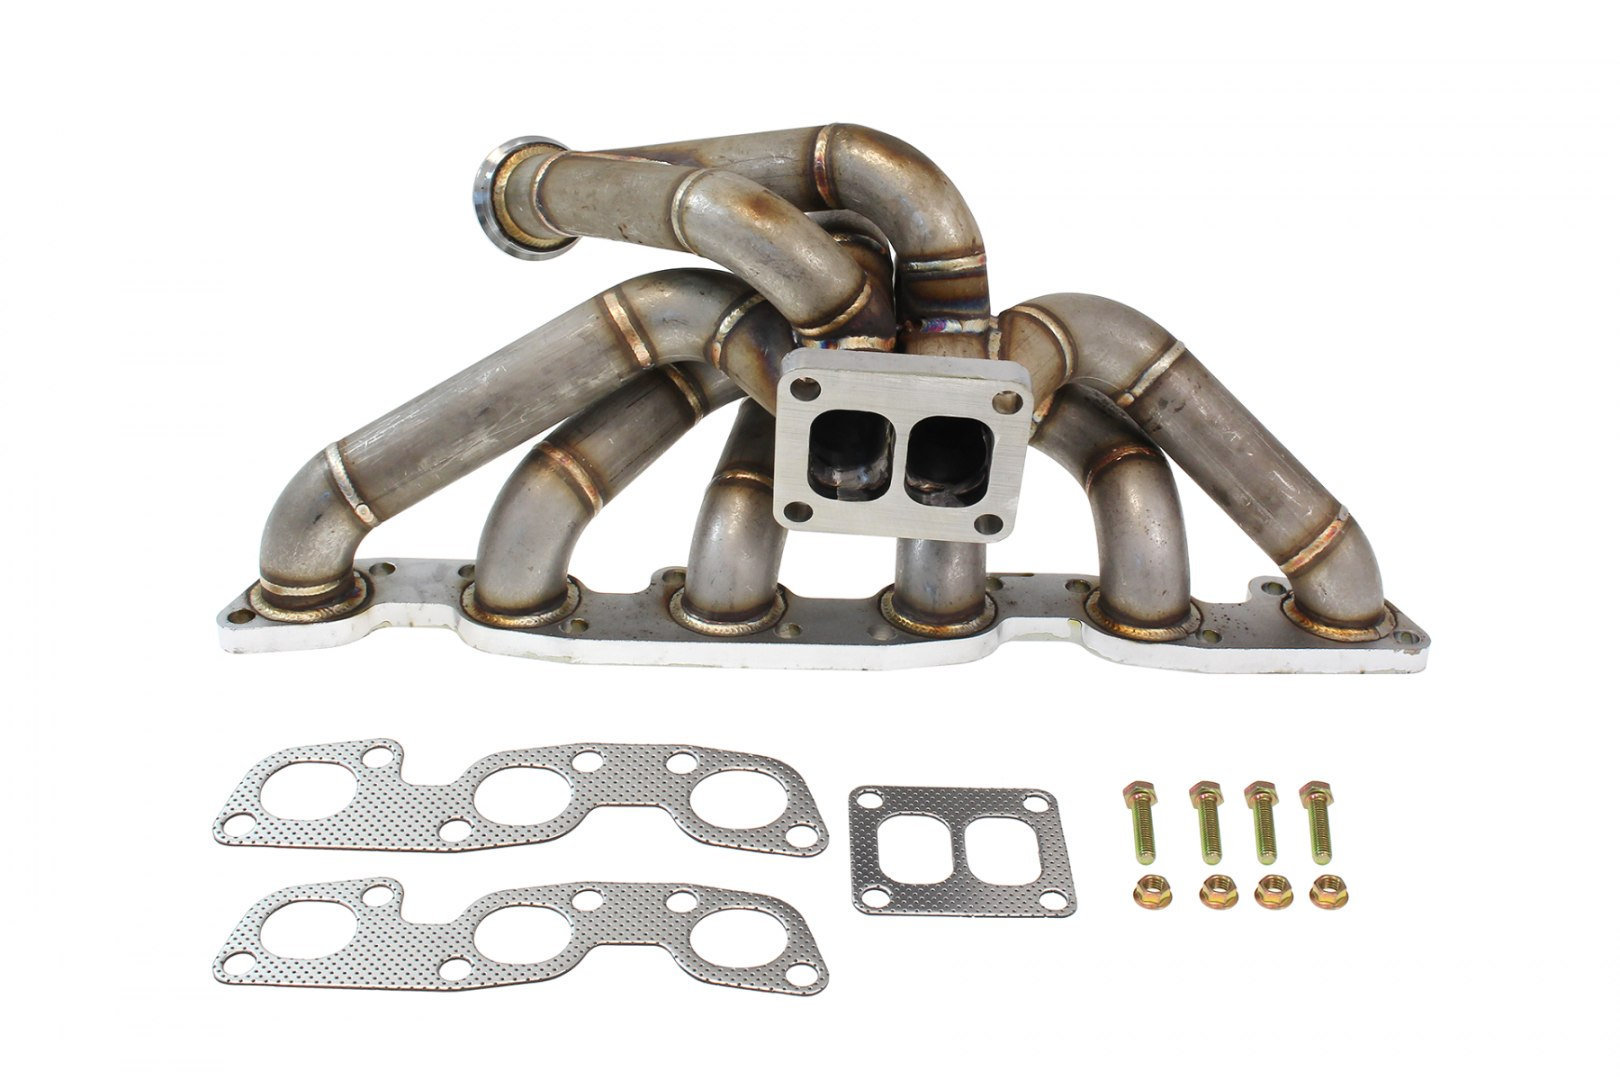 Kolektor wydechowy Nissan RB26 Twin Scroll EXTREME - GRUBYGARAGE - Sklep Tuningowy